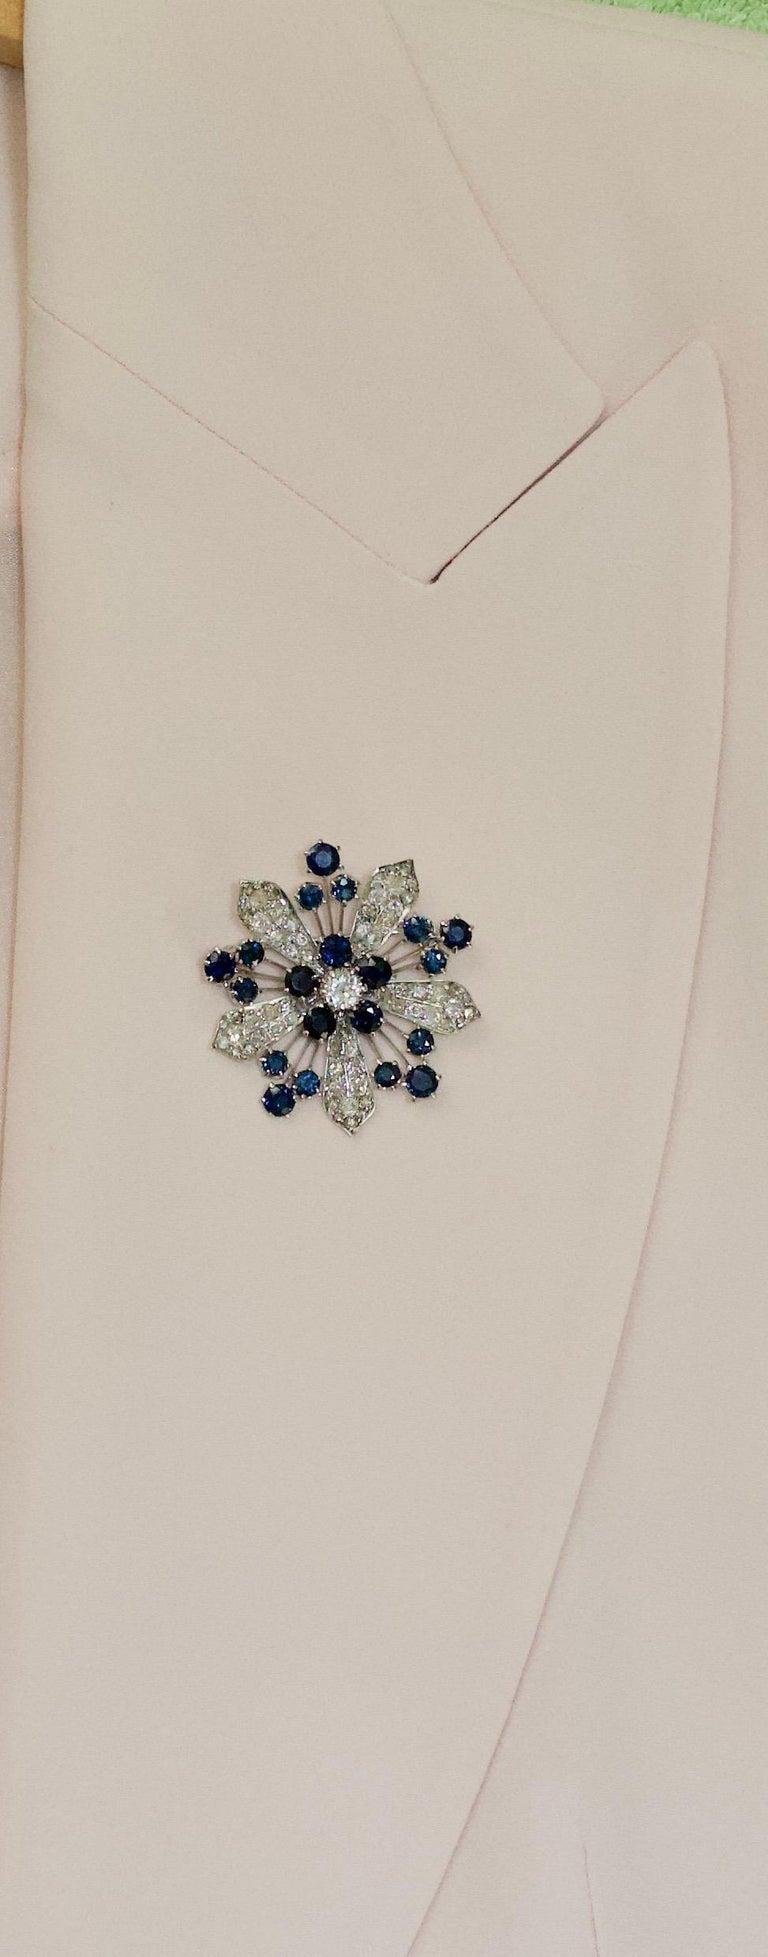 Platinum Diamond and Sapphire Brooch, Necklace circa 1920s 6.85 Carat For Sale 6